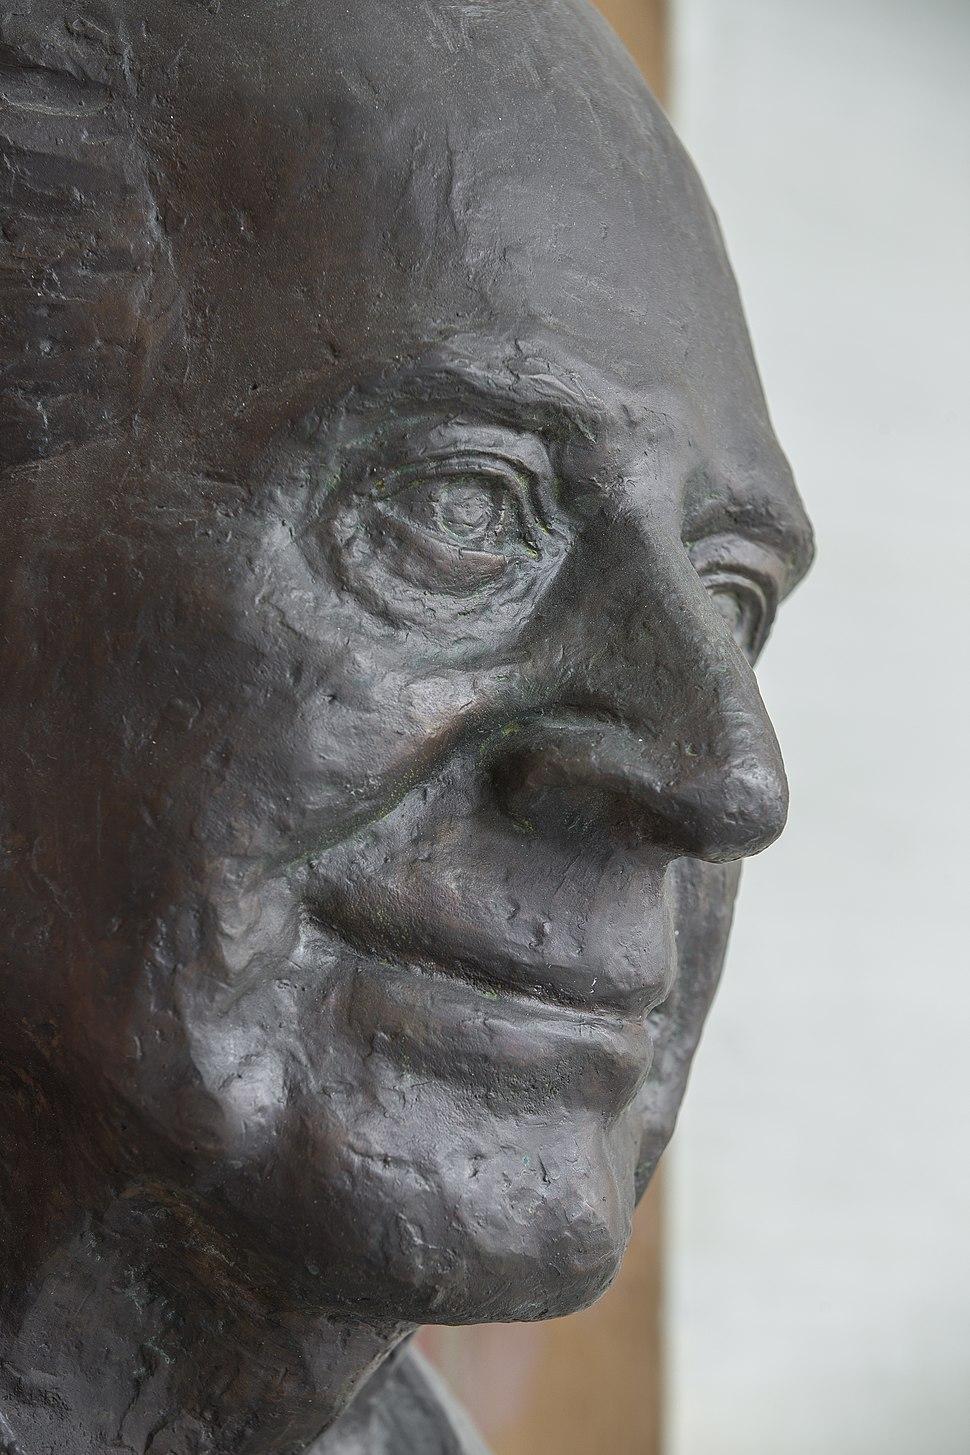 Karl Popper (1902-1994), Nr. 104 bust (bronze) in the Arkadenhof of the University of Vienna-2485